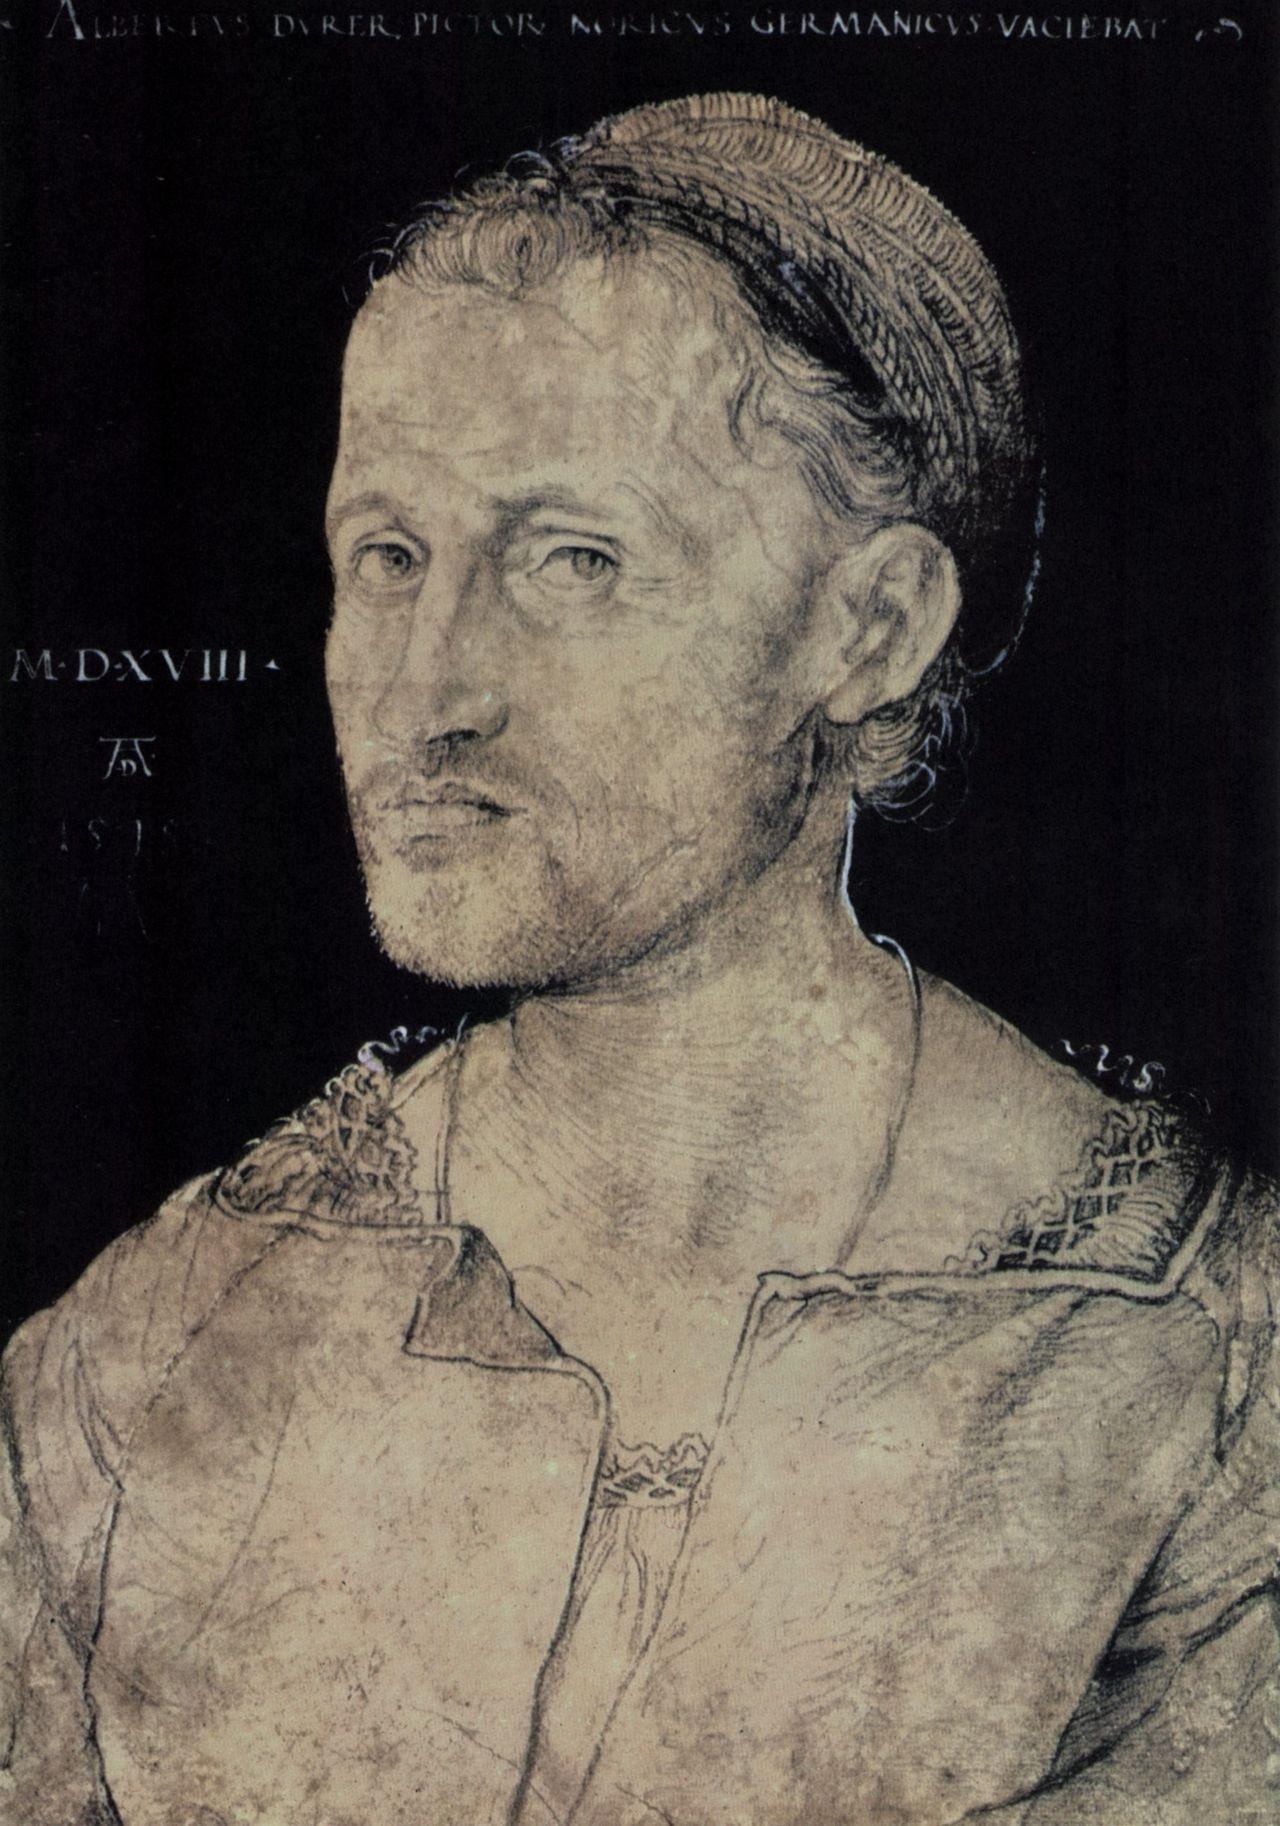 Albrecht Durer: Hans Elder Port - arthurboehm | ello